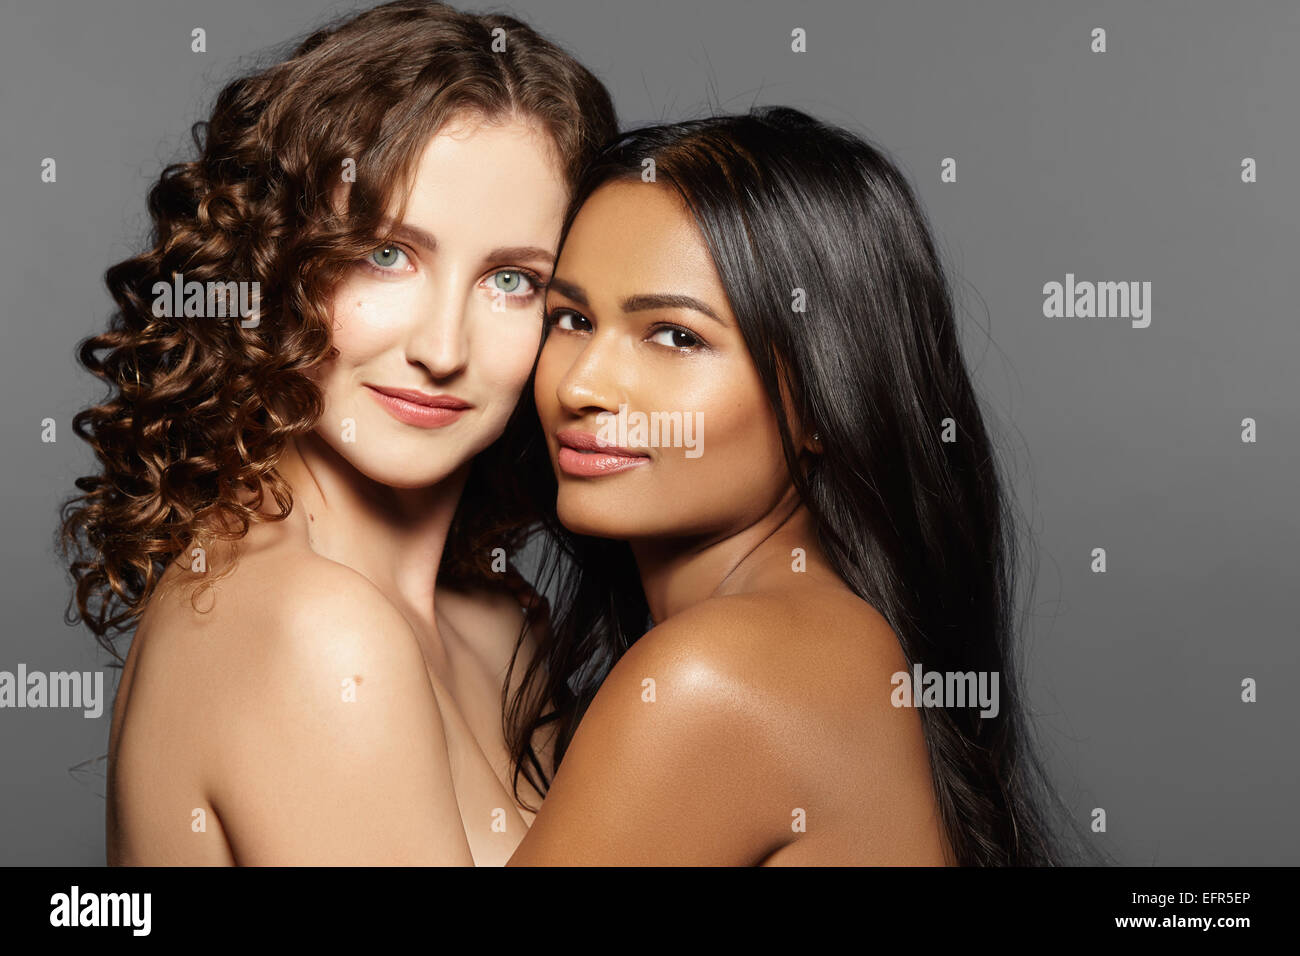 Female models hugging - Stock Image